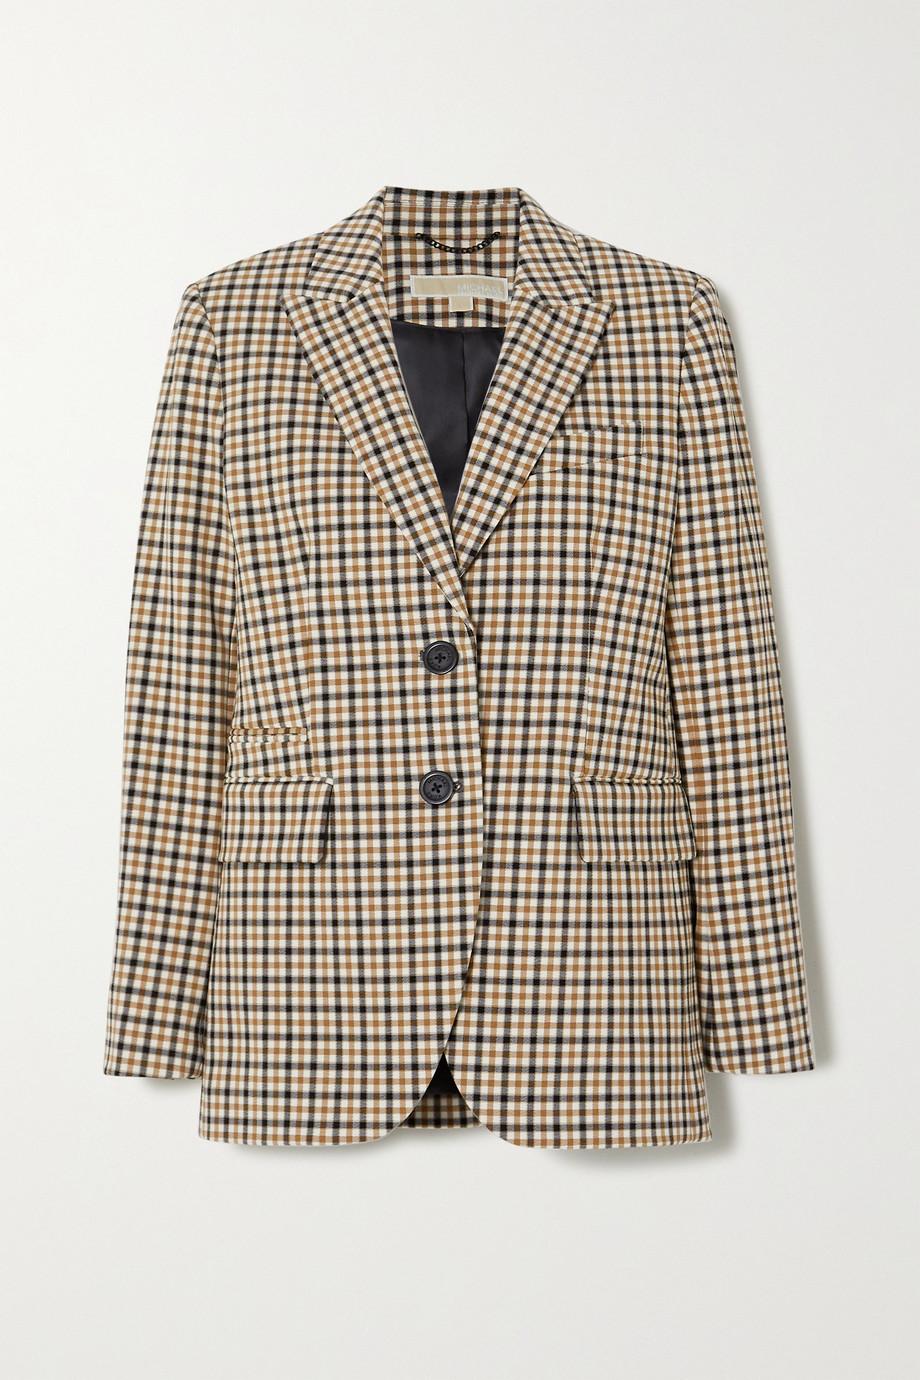 MICHAEL Michael Kors 格纹斜纹布西装外套